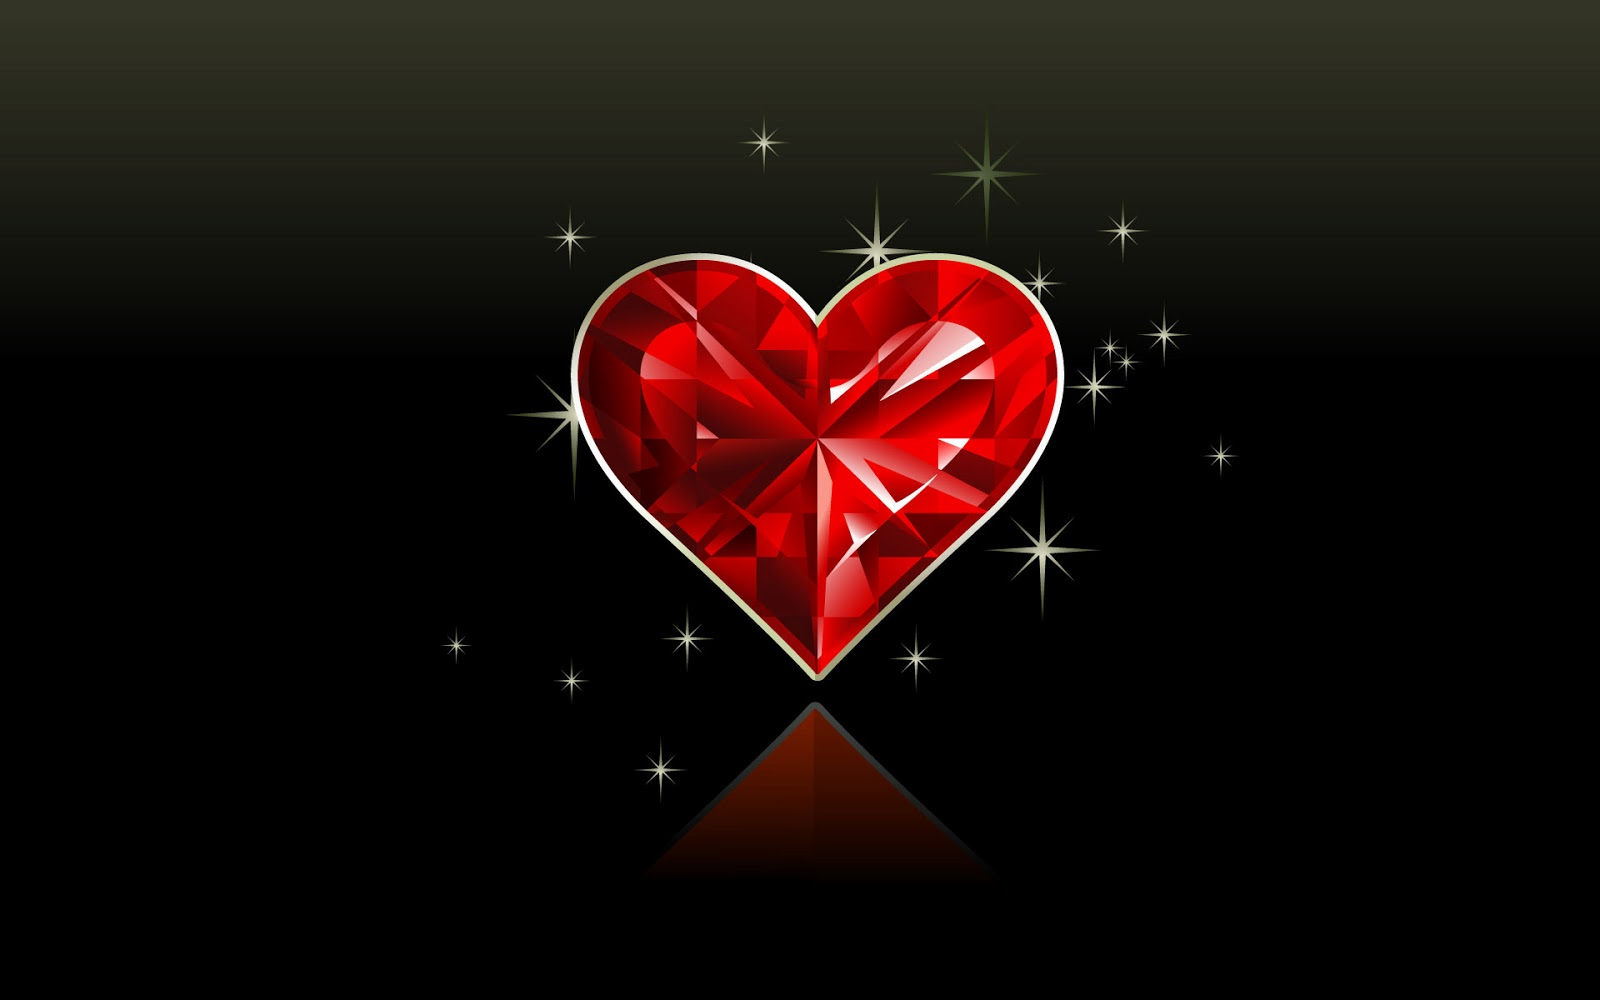 Wallpaper Desk : Heart love background, wallpaper hearts loveWallpaper Desk